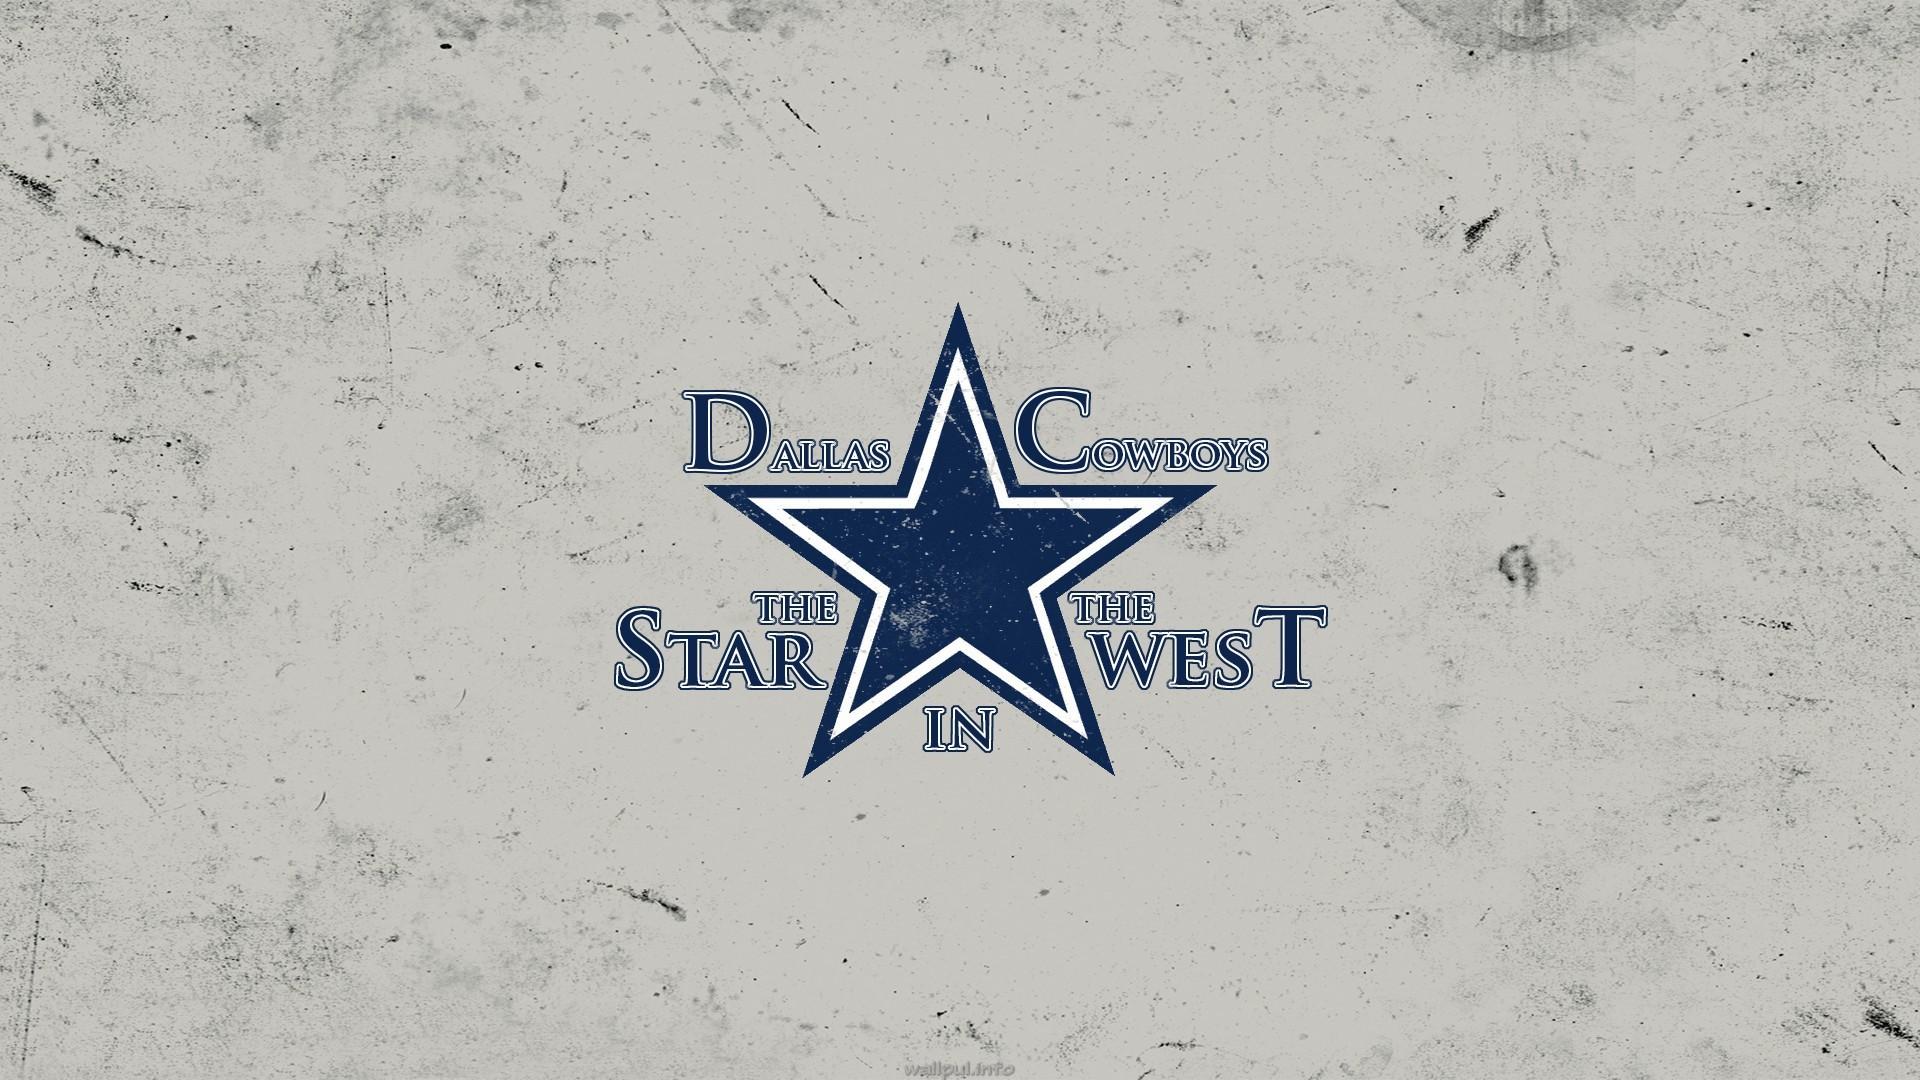 Sports Dallas Cowboys Wallpaper Widescreen Sports Dallas Cowboys Wallpaper  1080p …